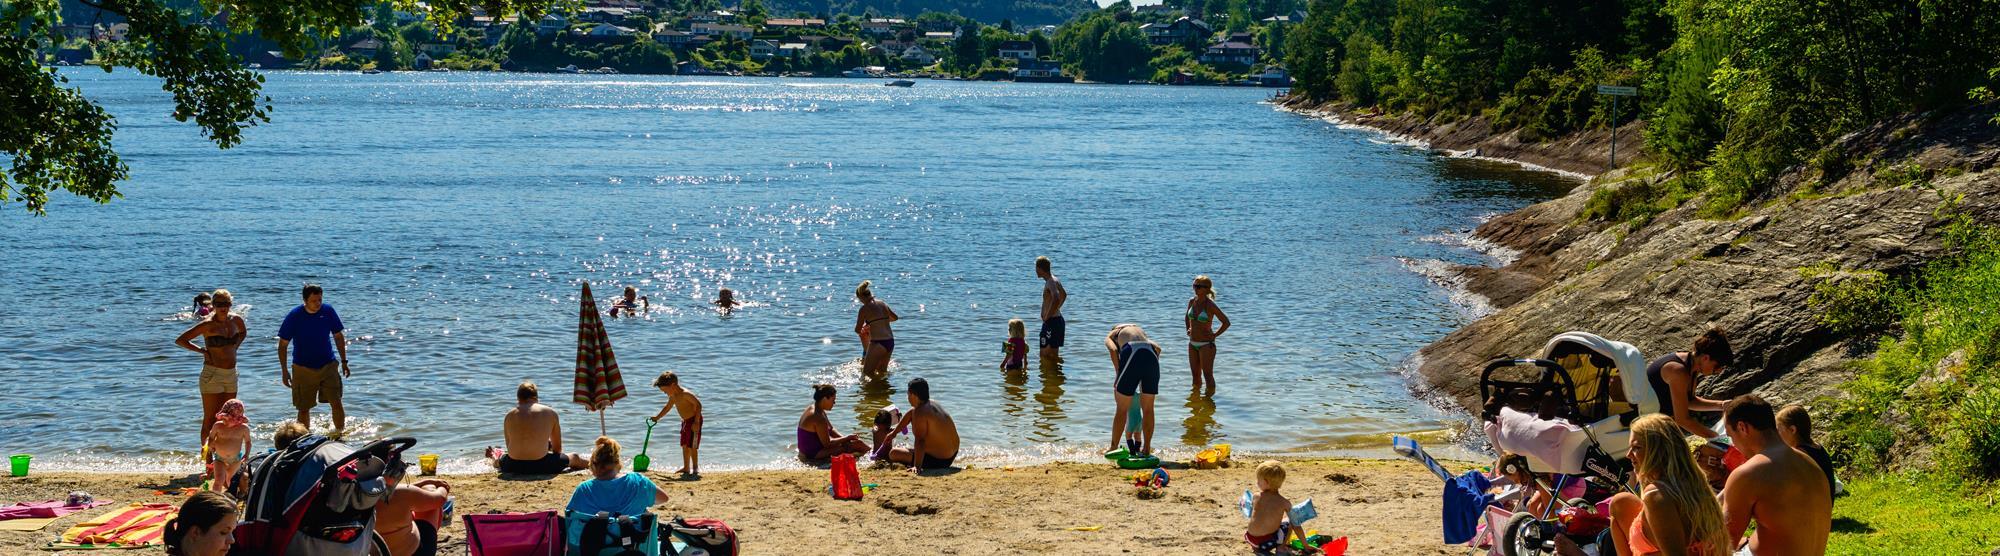 Beaches in Bergen